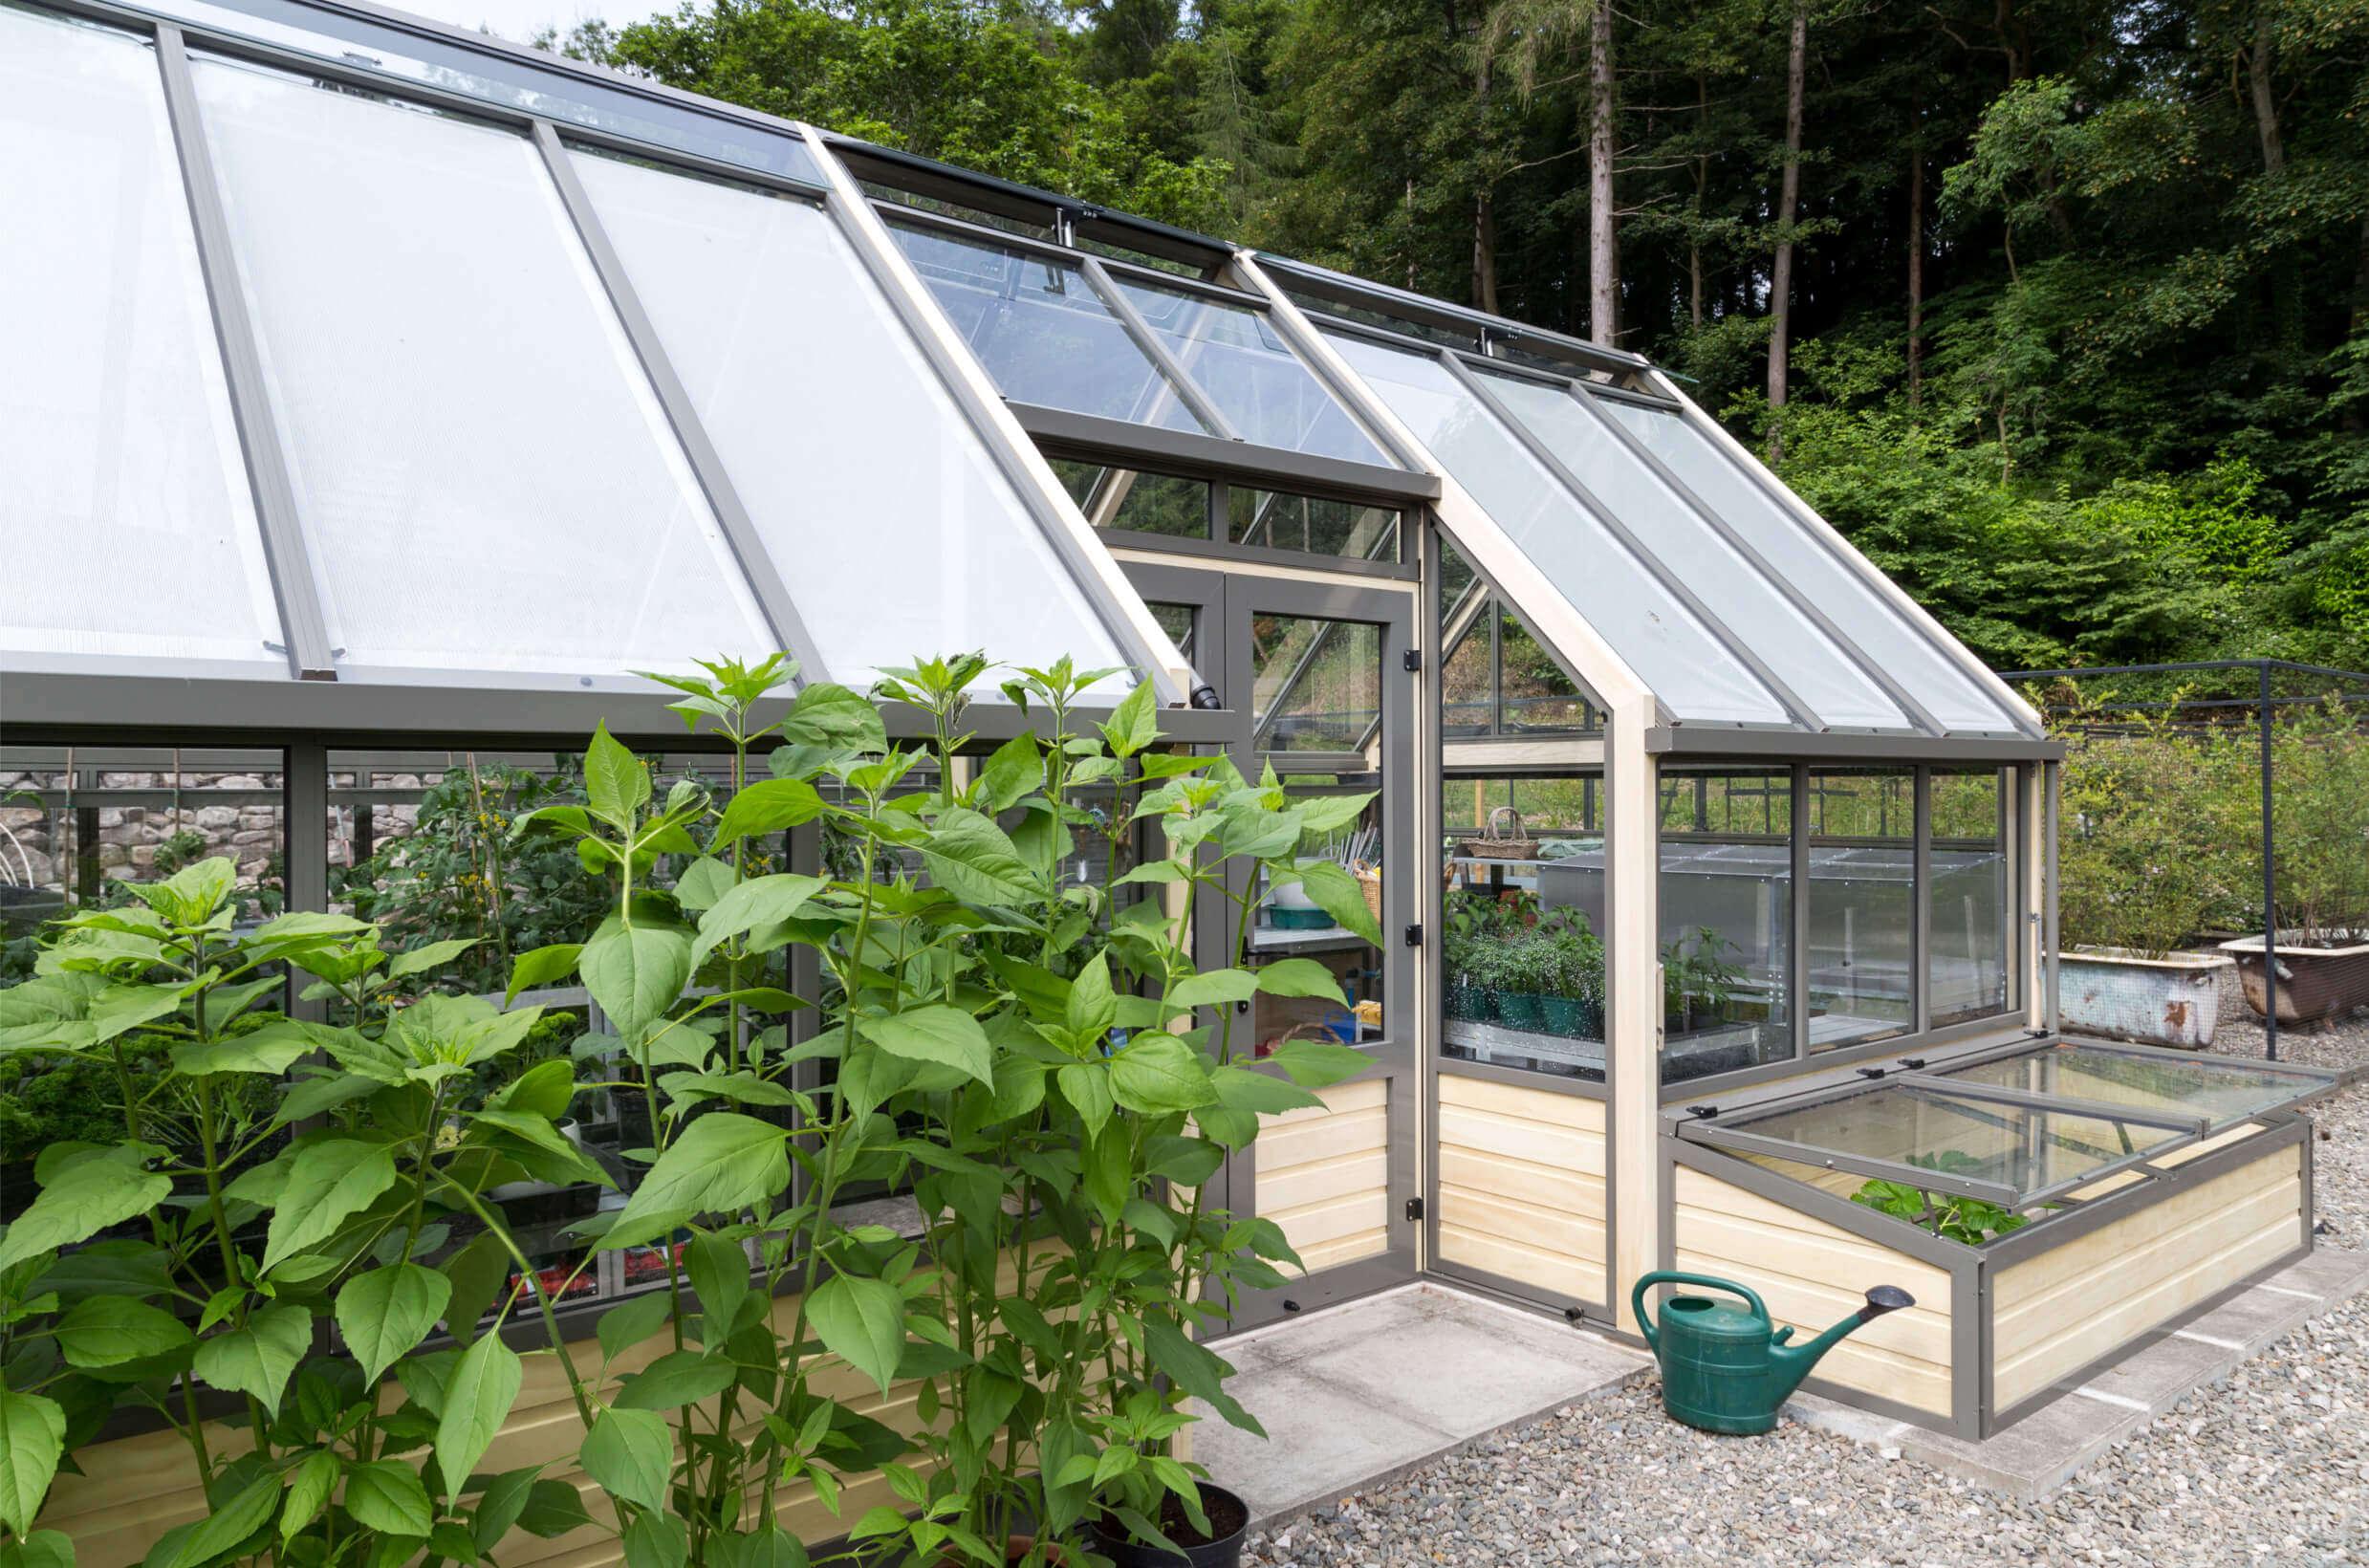 different greenhouse design